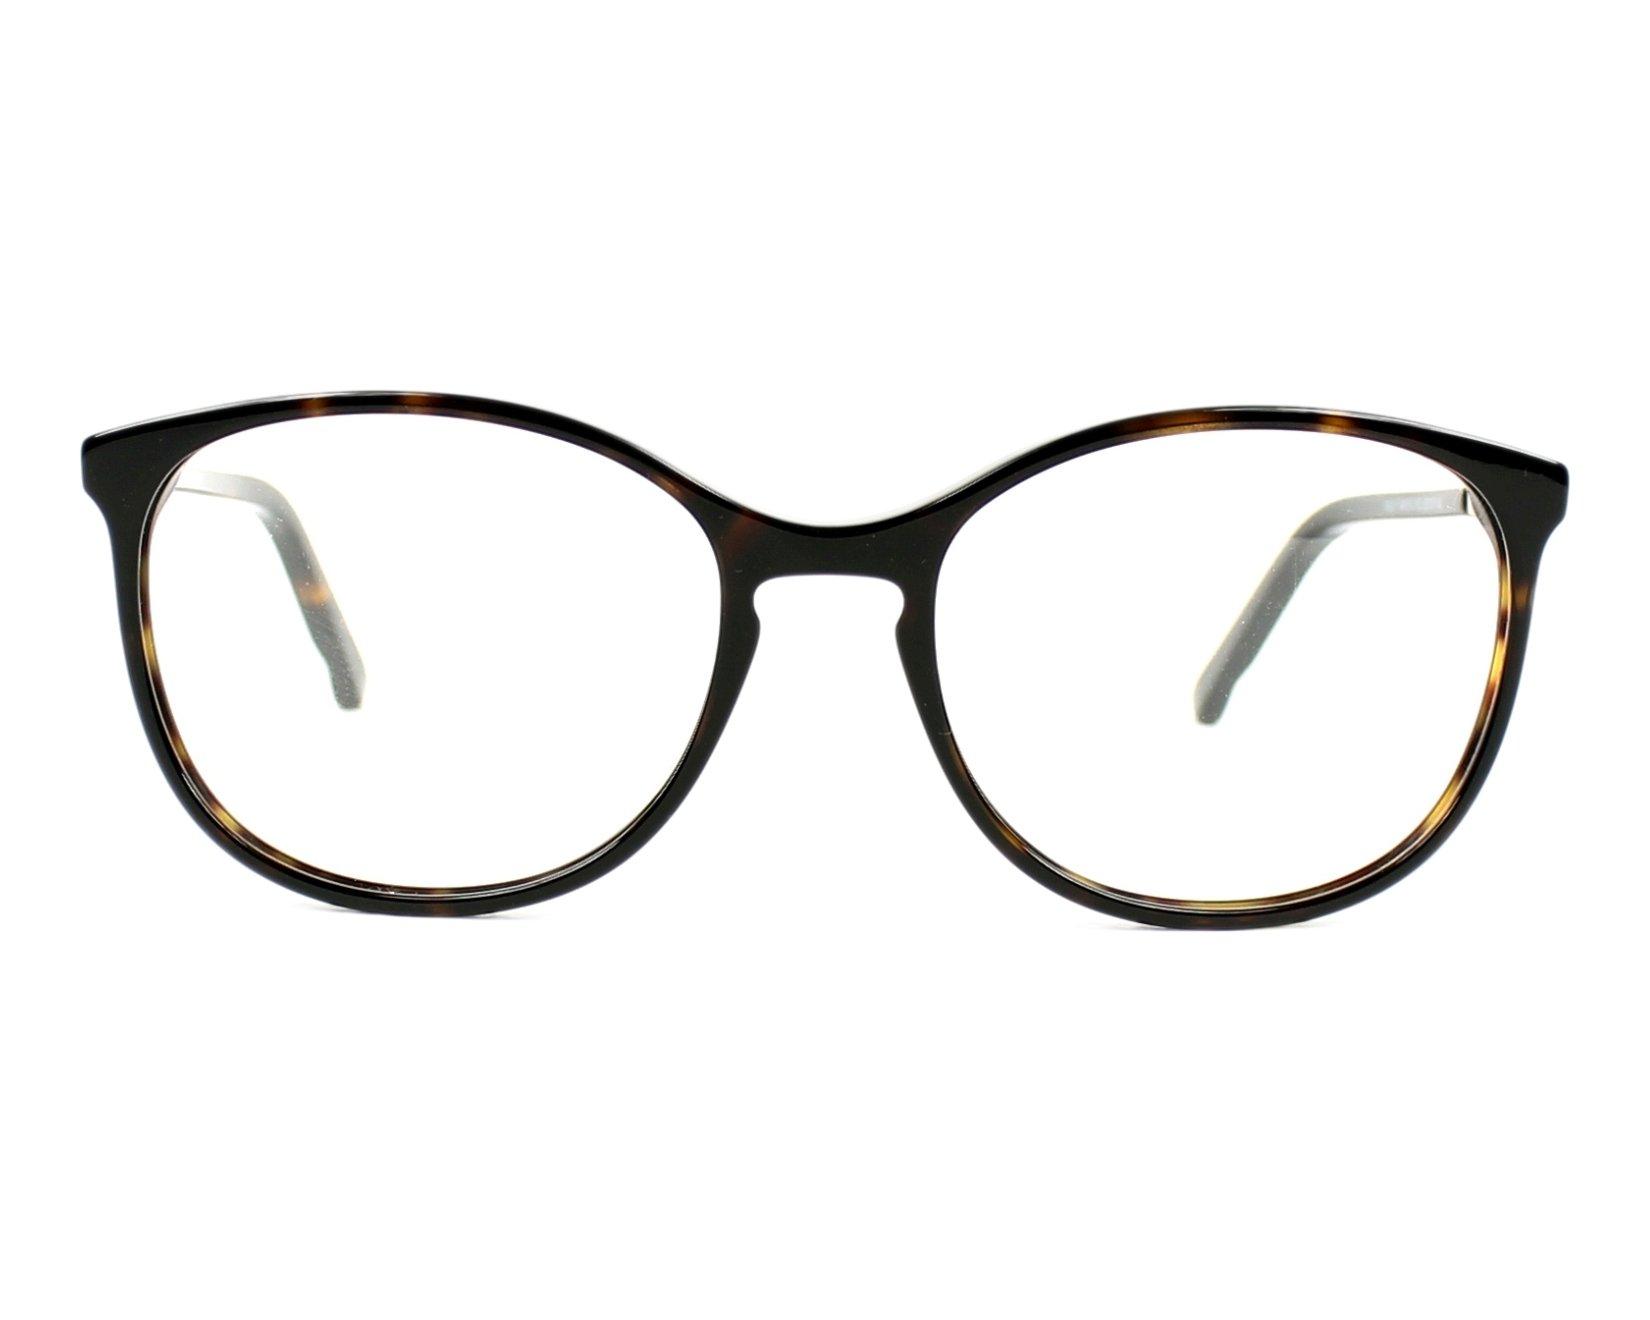 cffab3a304bf eyeglasses Swarovski SW-5163 052 52-17 Havana front view